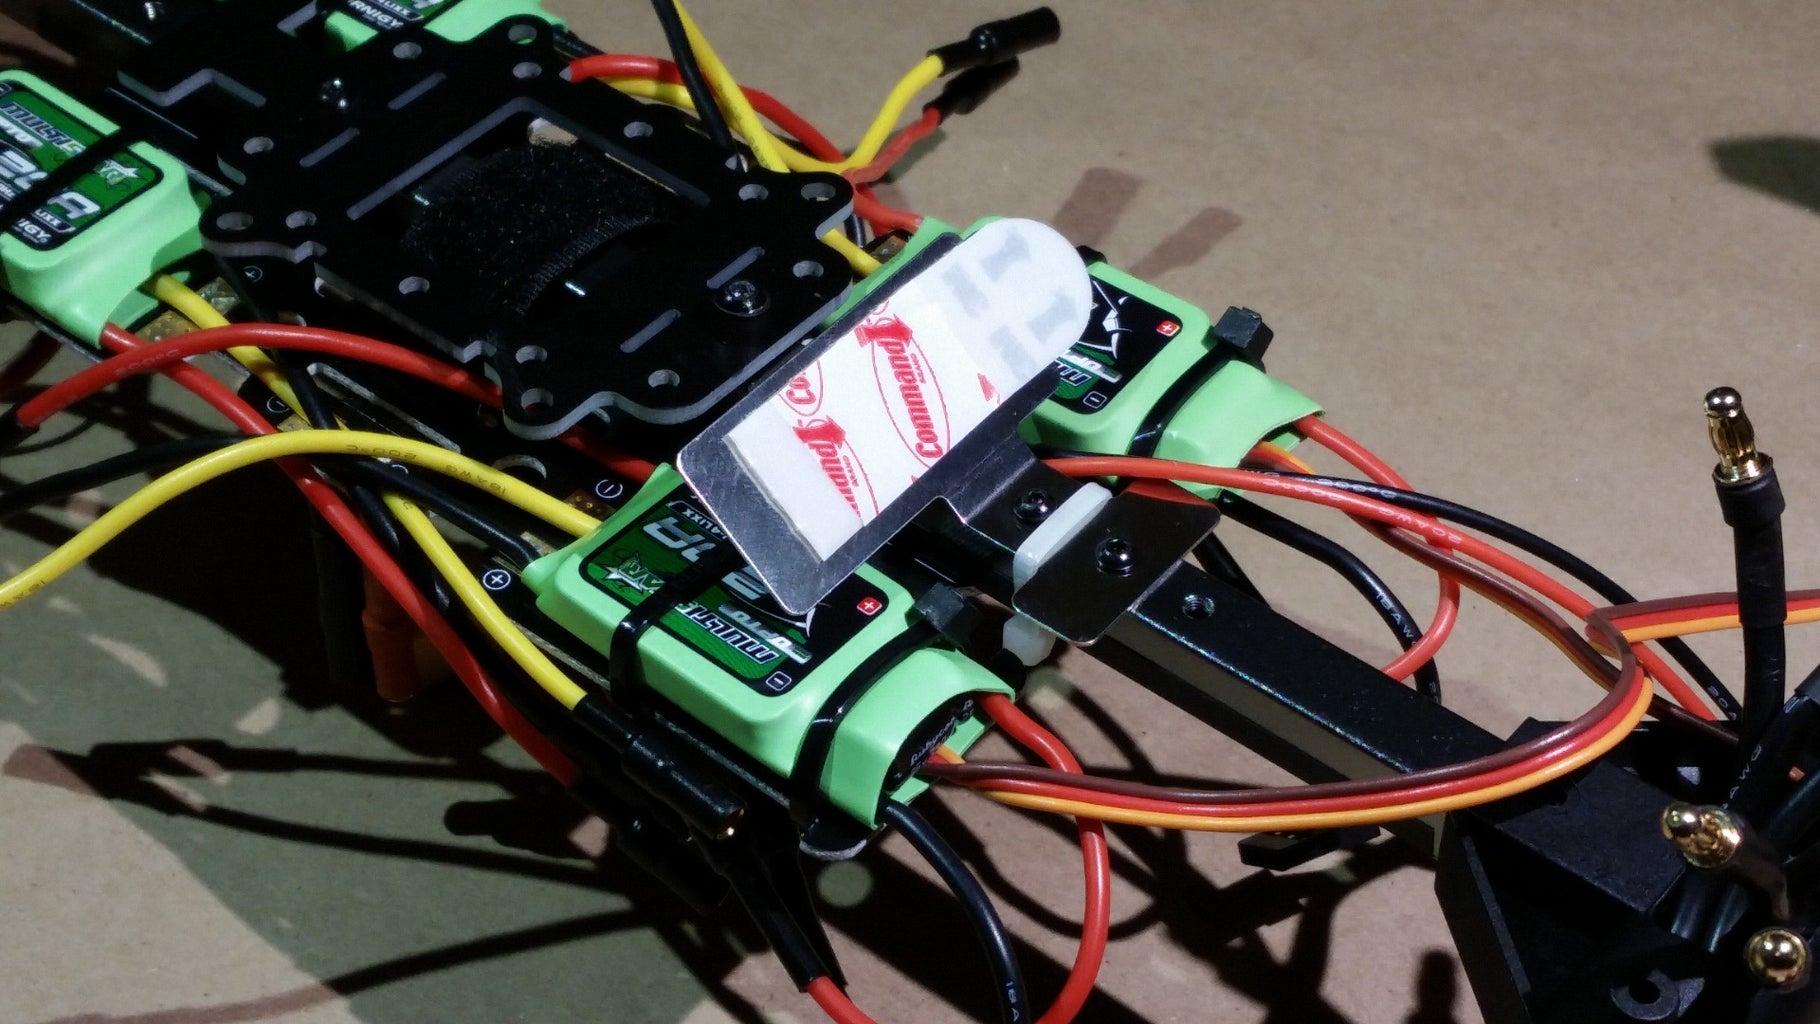 Install DJI LED Indicator